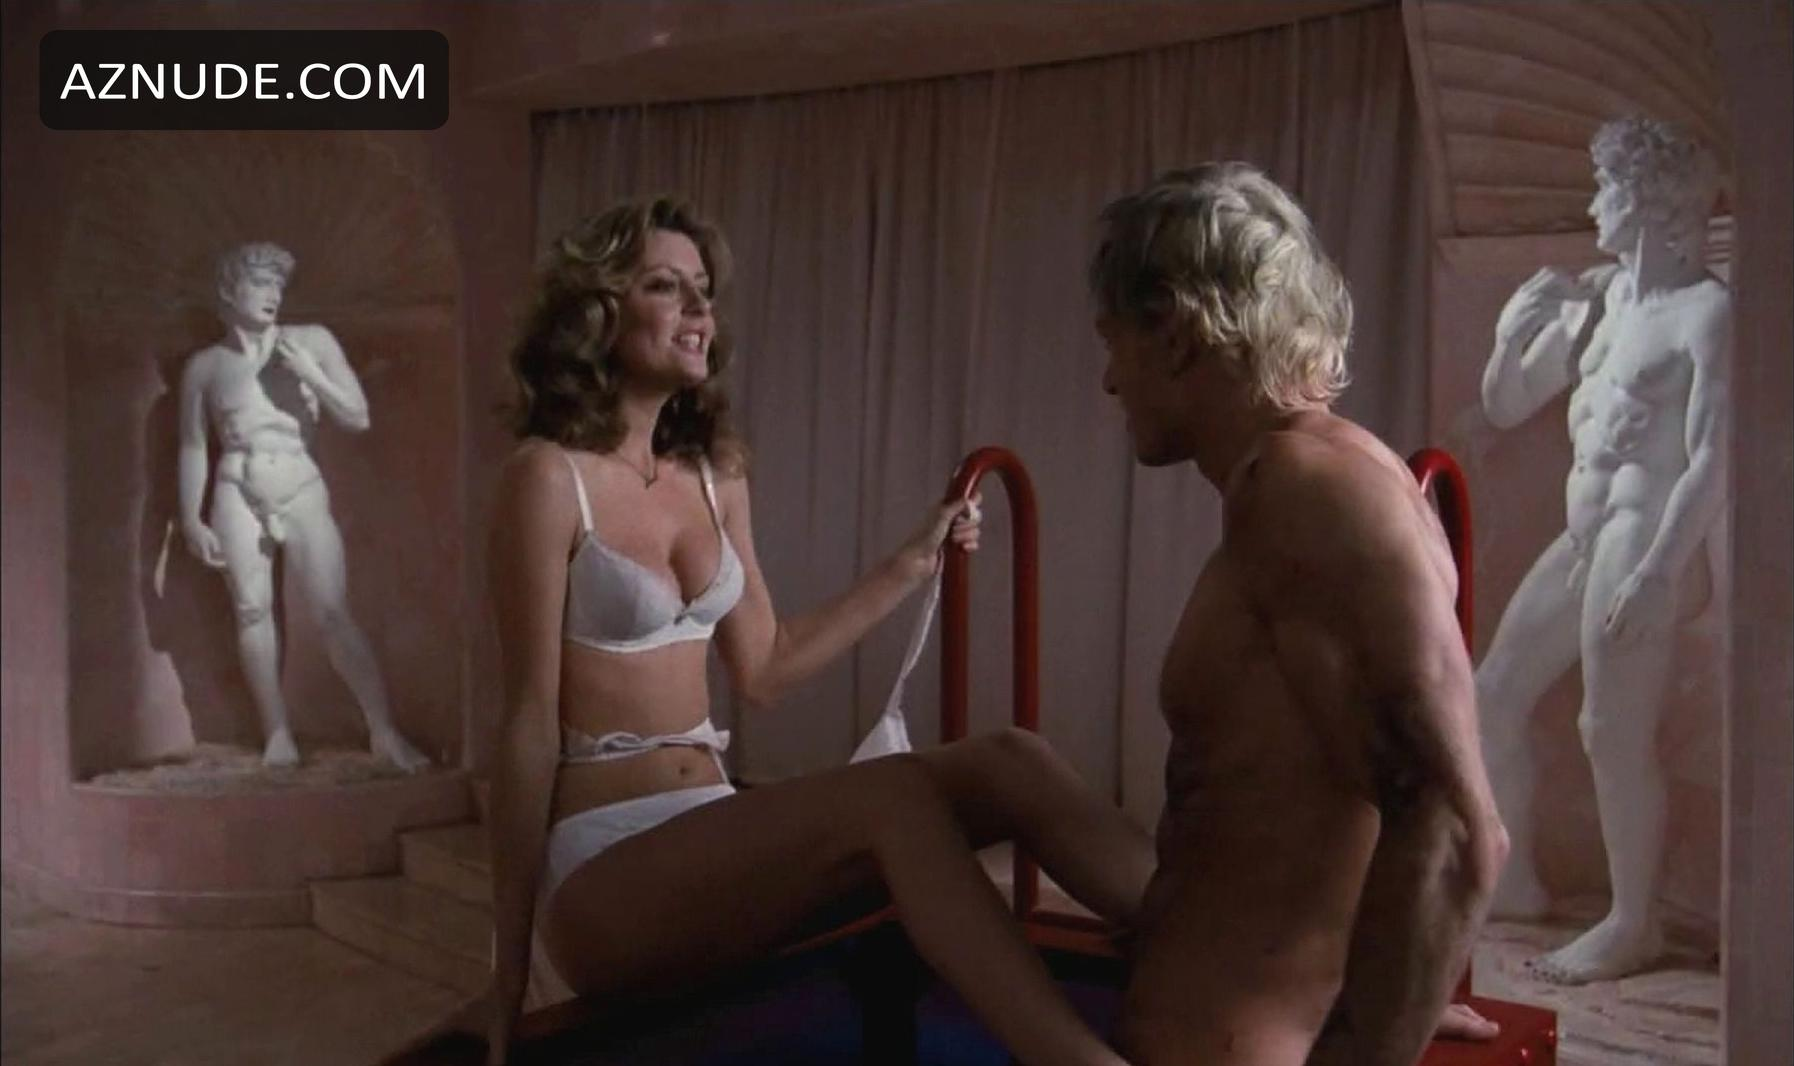 For Rocky horror sex scene opinion